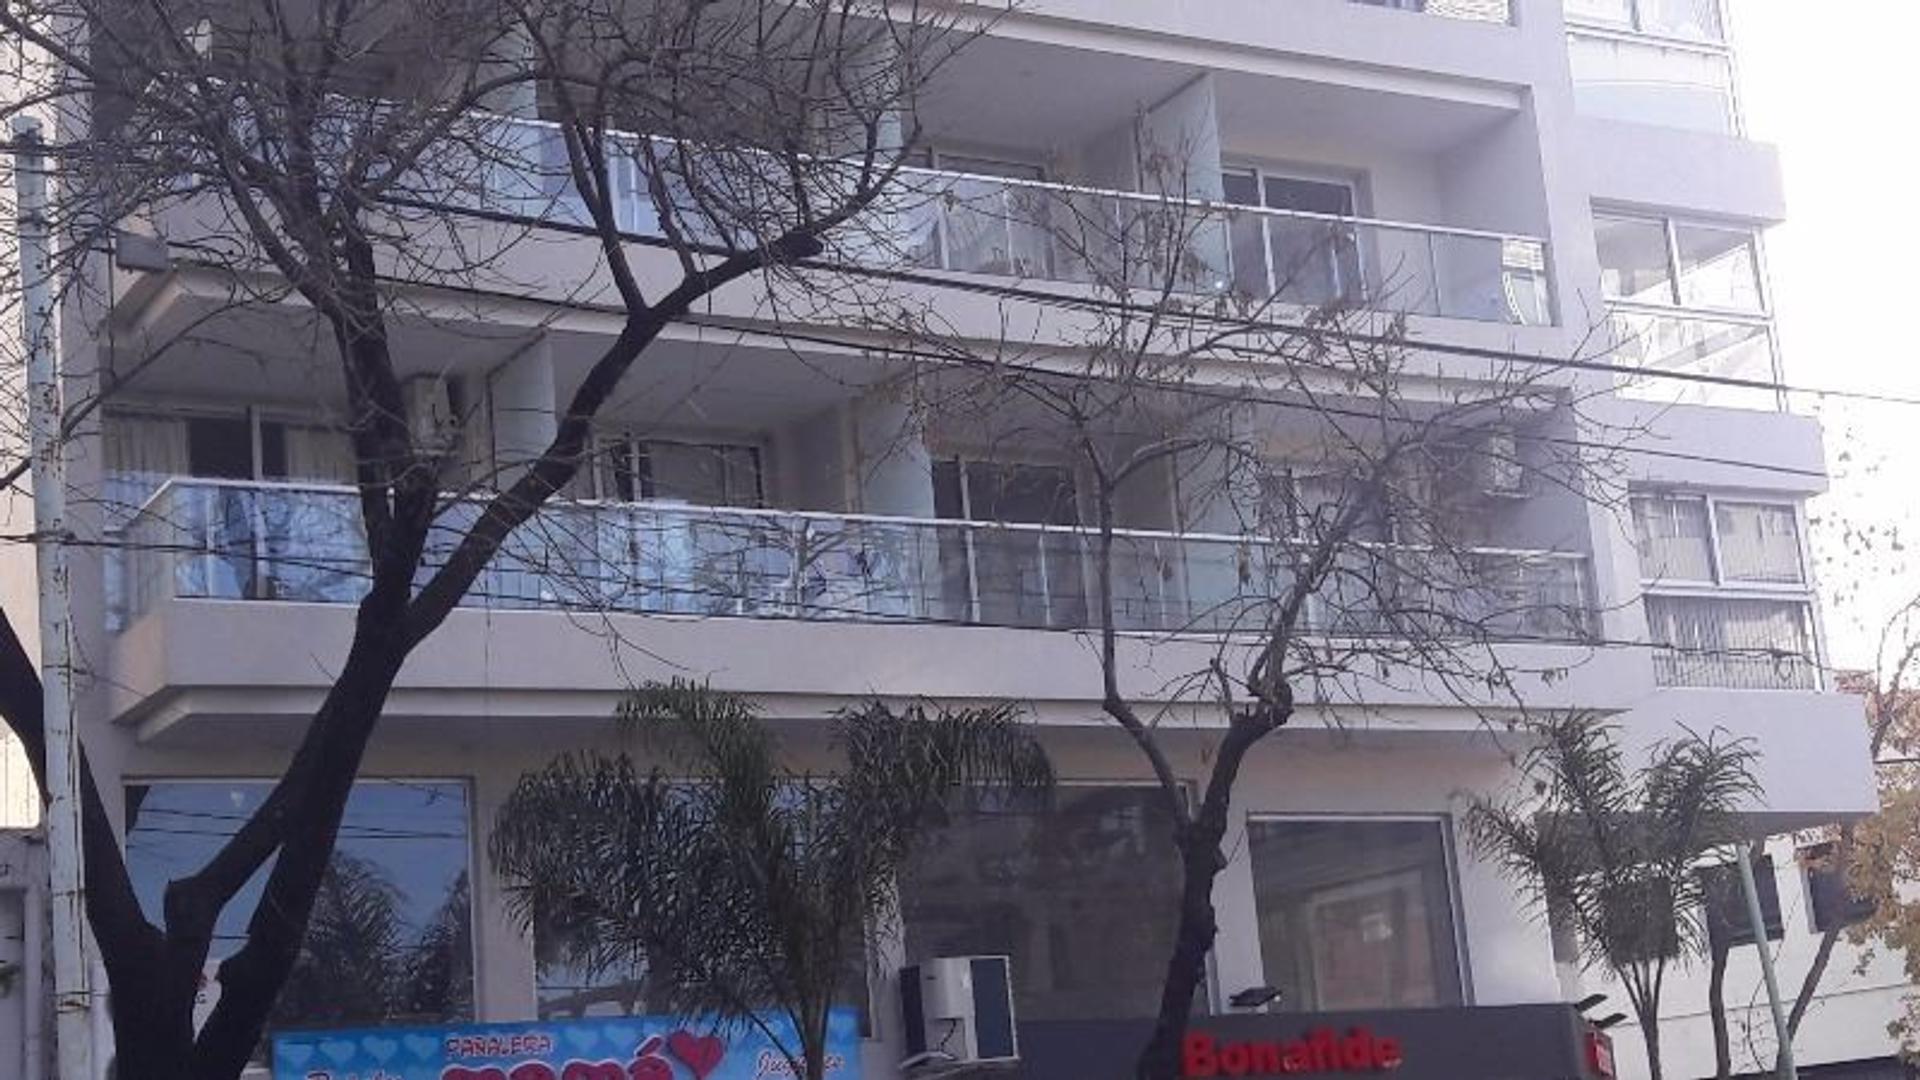 Monoambiente al fte c/ balcón - A estrenar - Edif.gran categ - Amenities -Optimos detall de construc